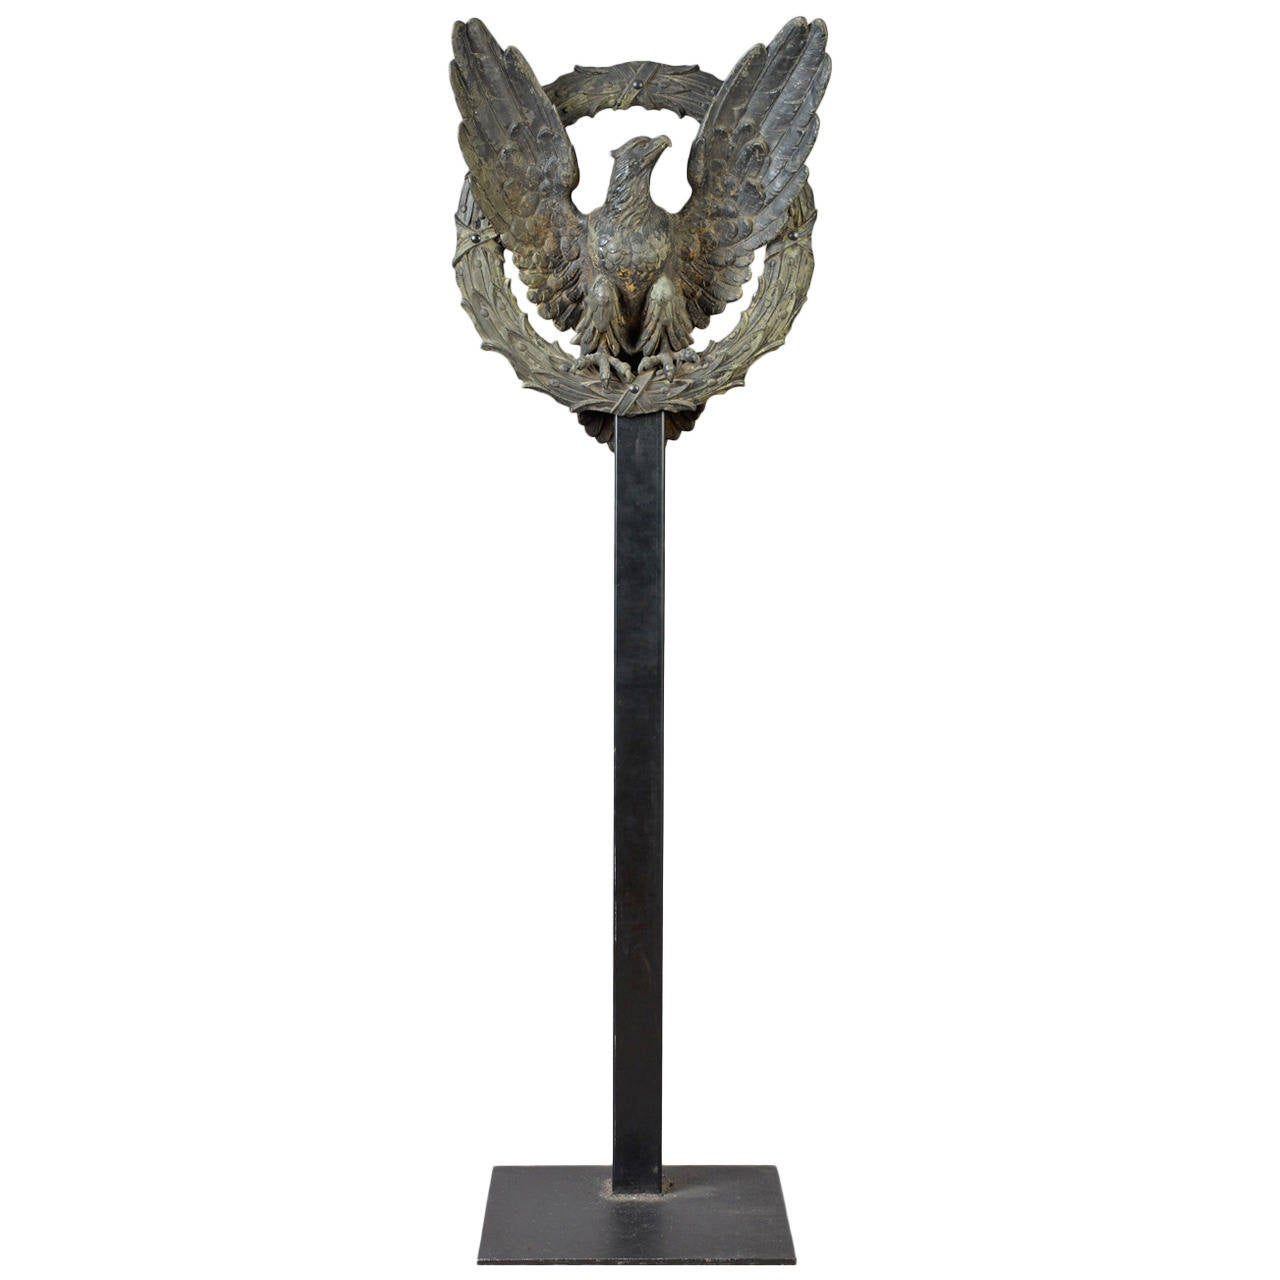 Architectural Eagle and Laurel Wreath Element For Sale